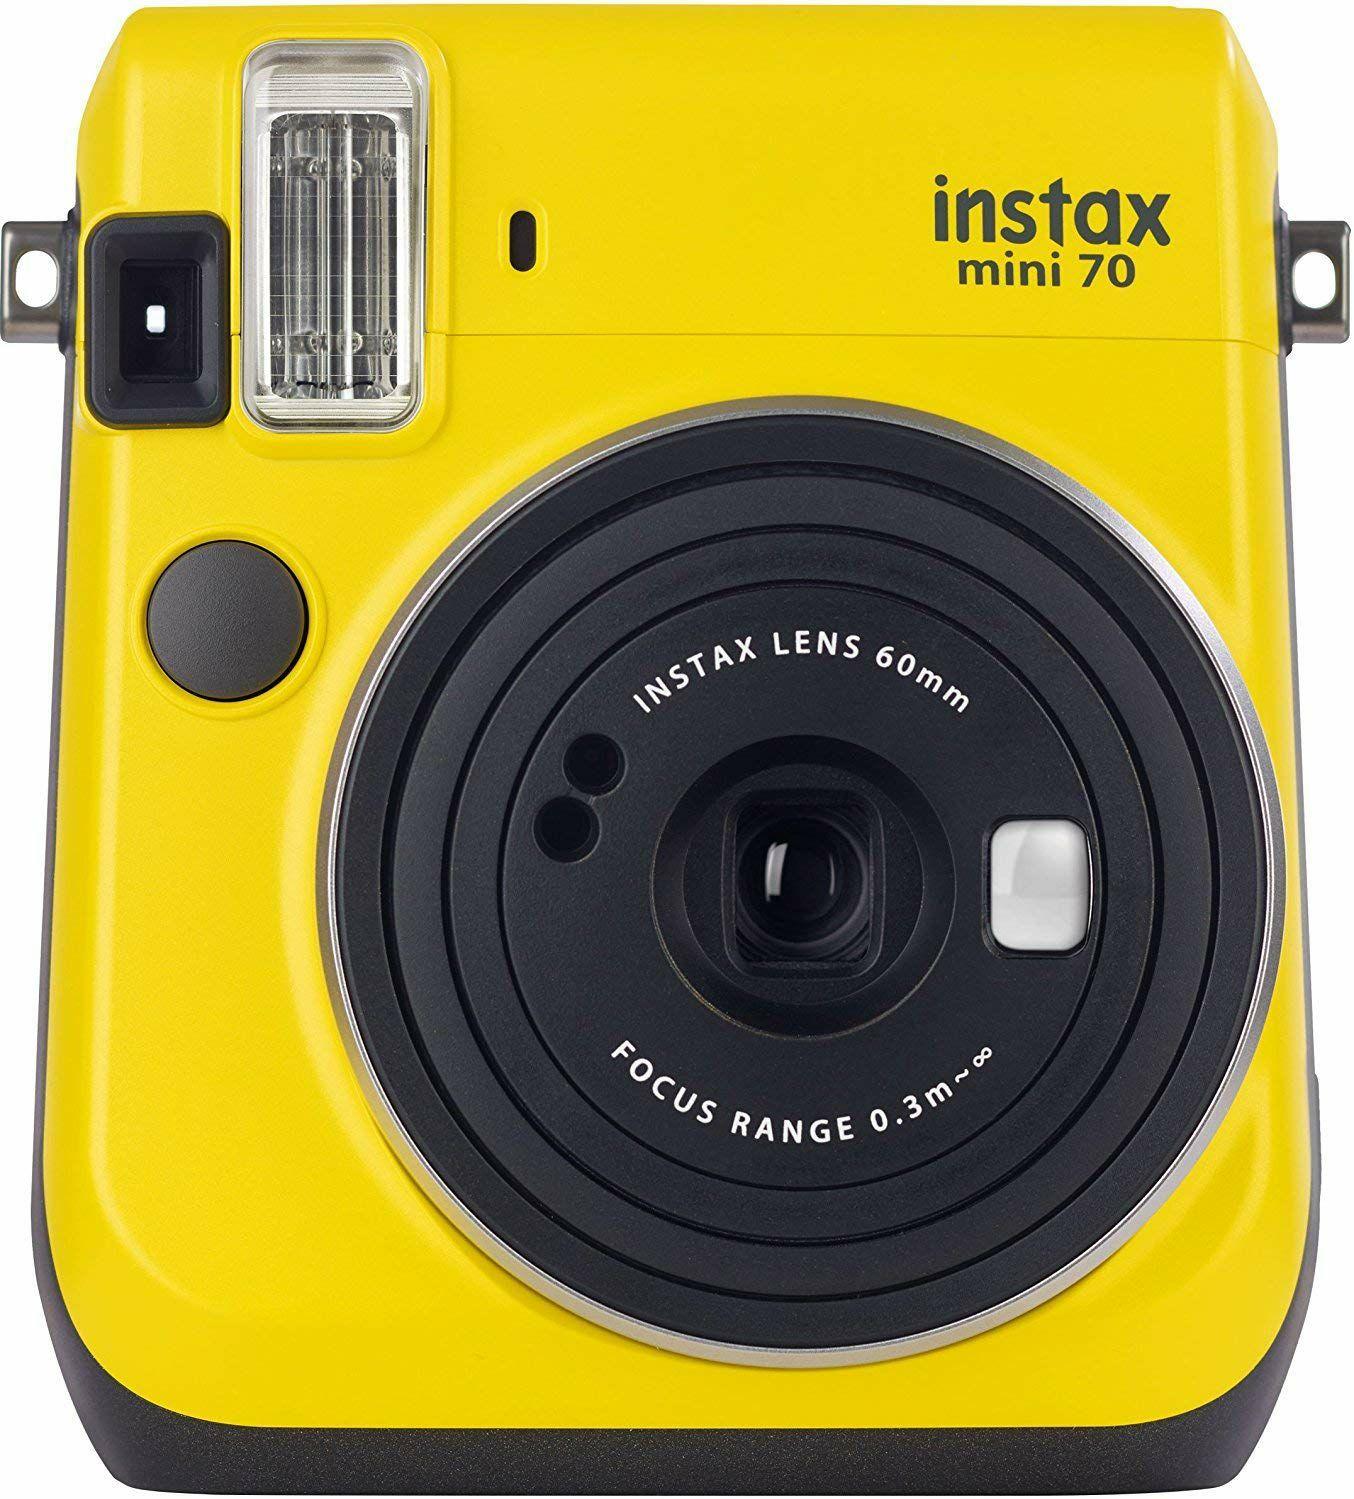 Fujifilm Instax Mini 70 Sofortbildkamera in gelb